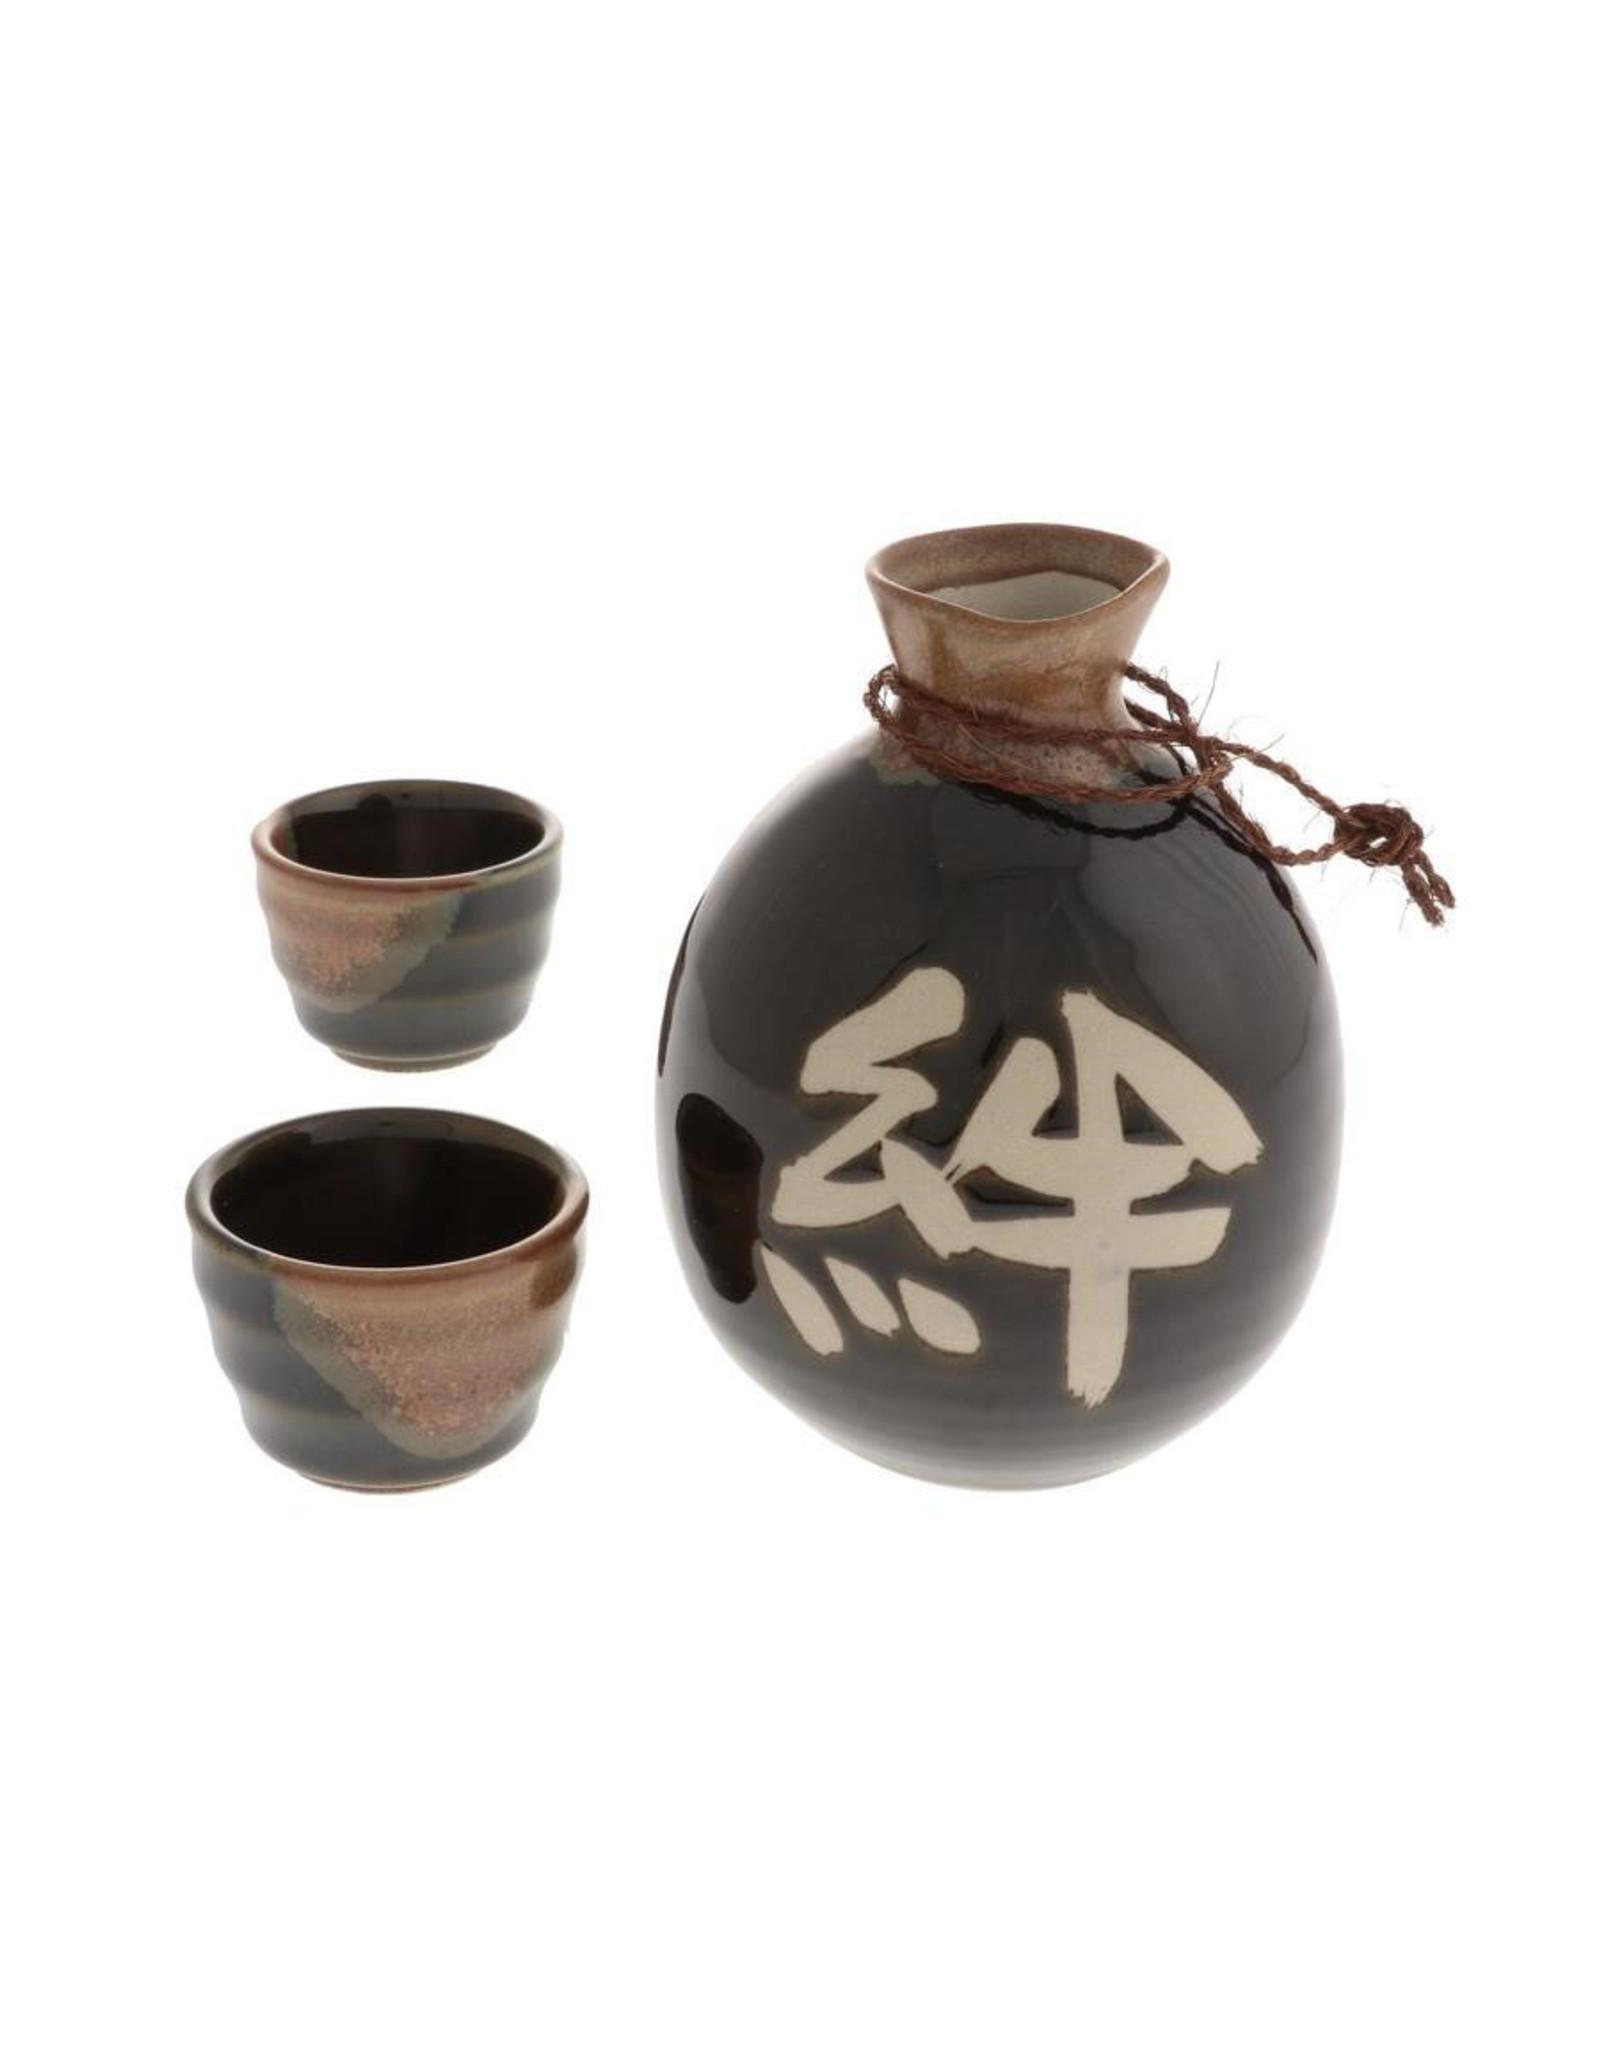 Oribe Kizuna Bonds Sake Set of 2